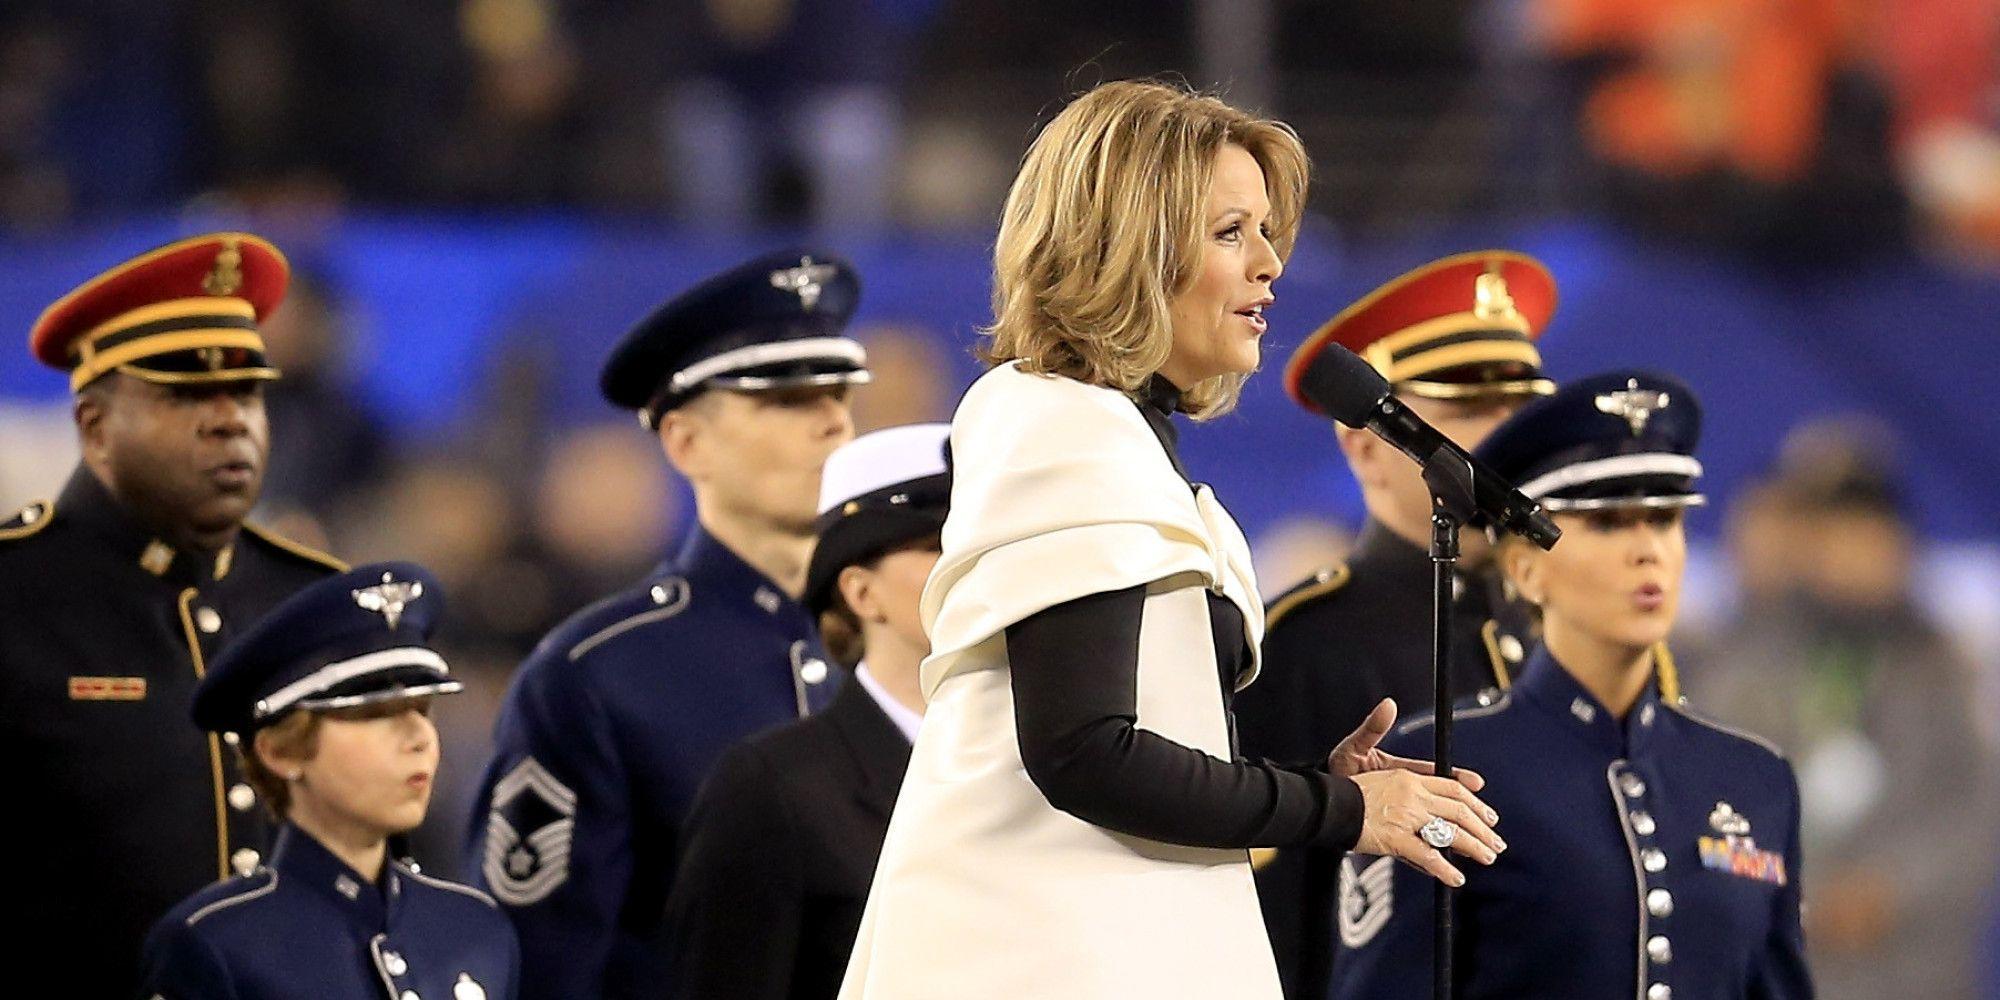 Opera Singer Stuns With National Anthem